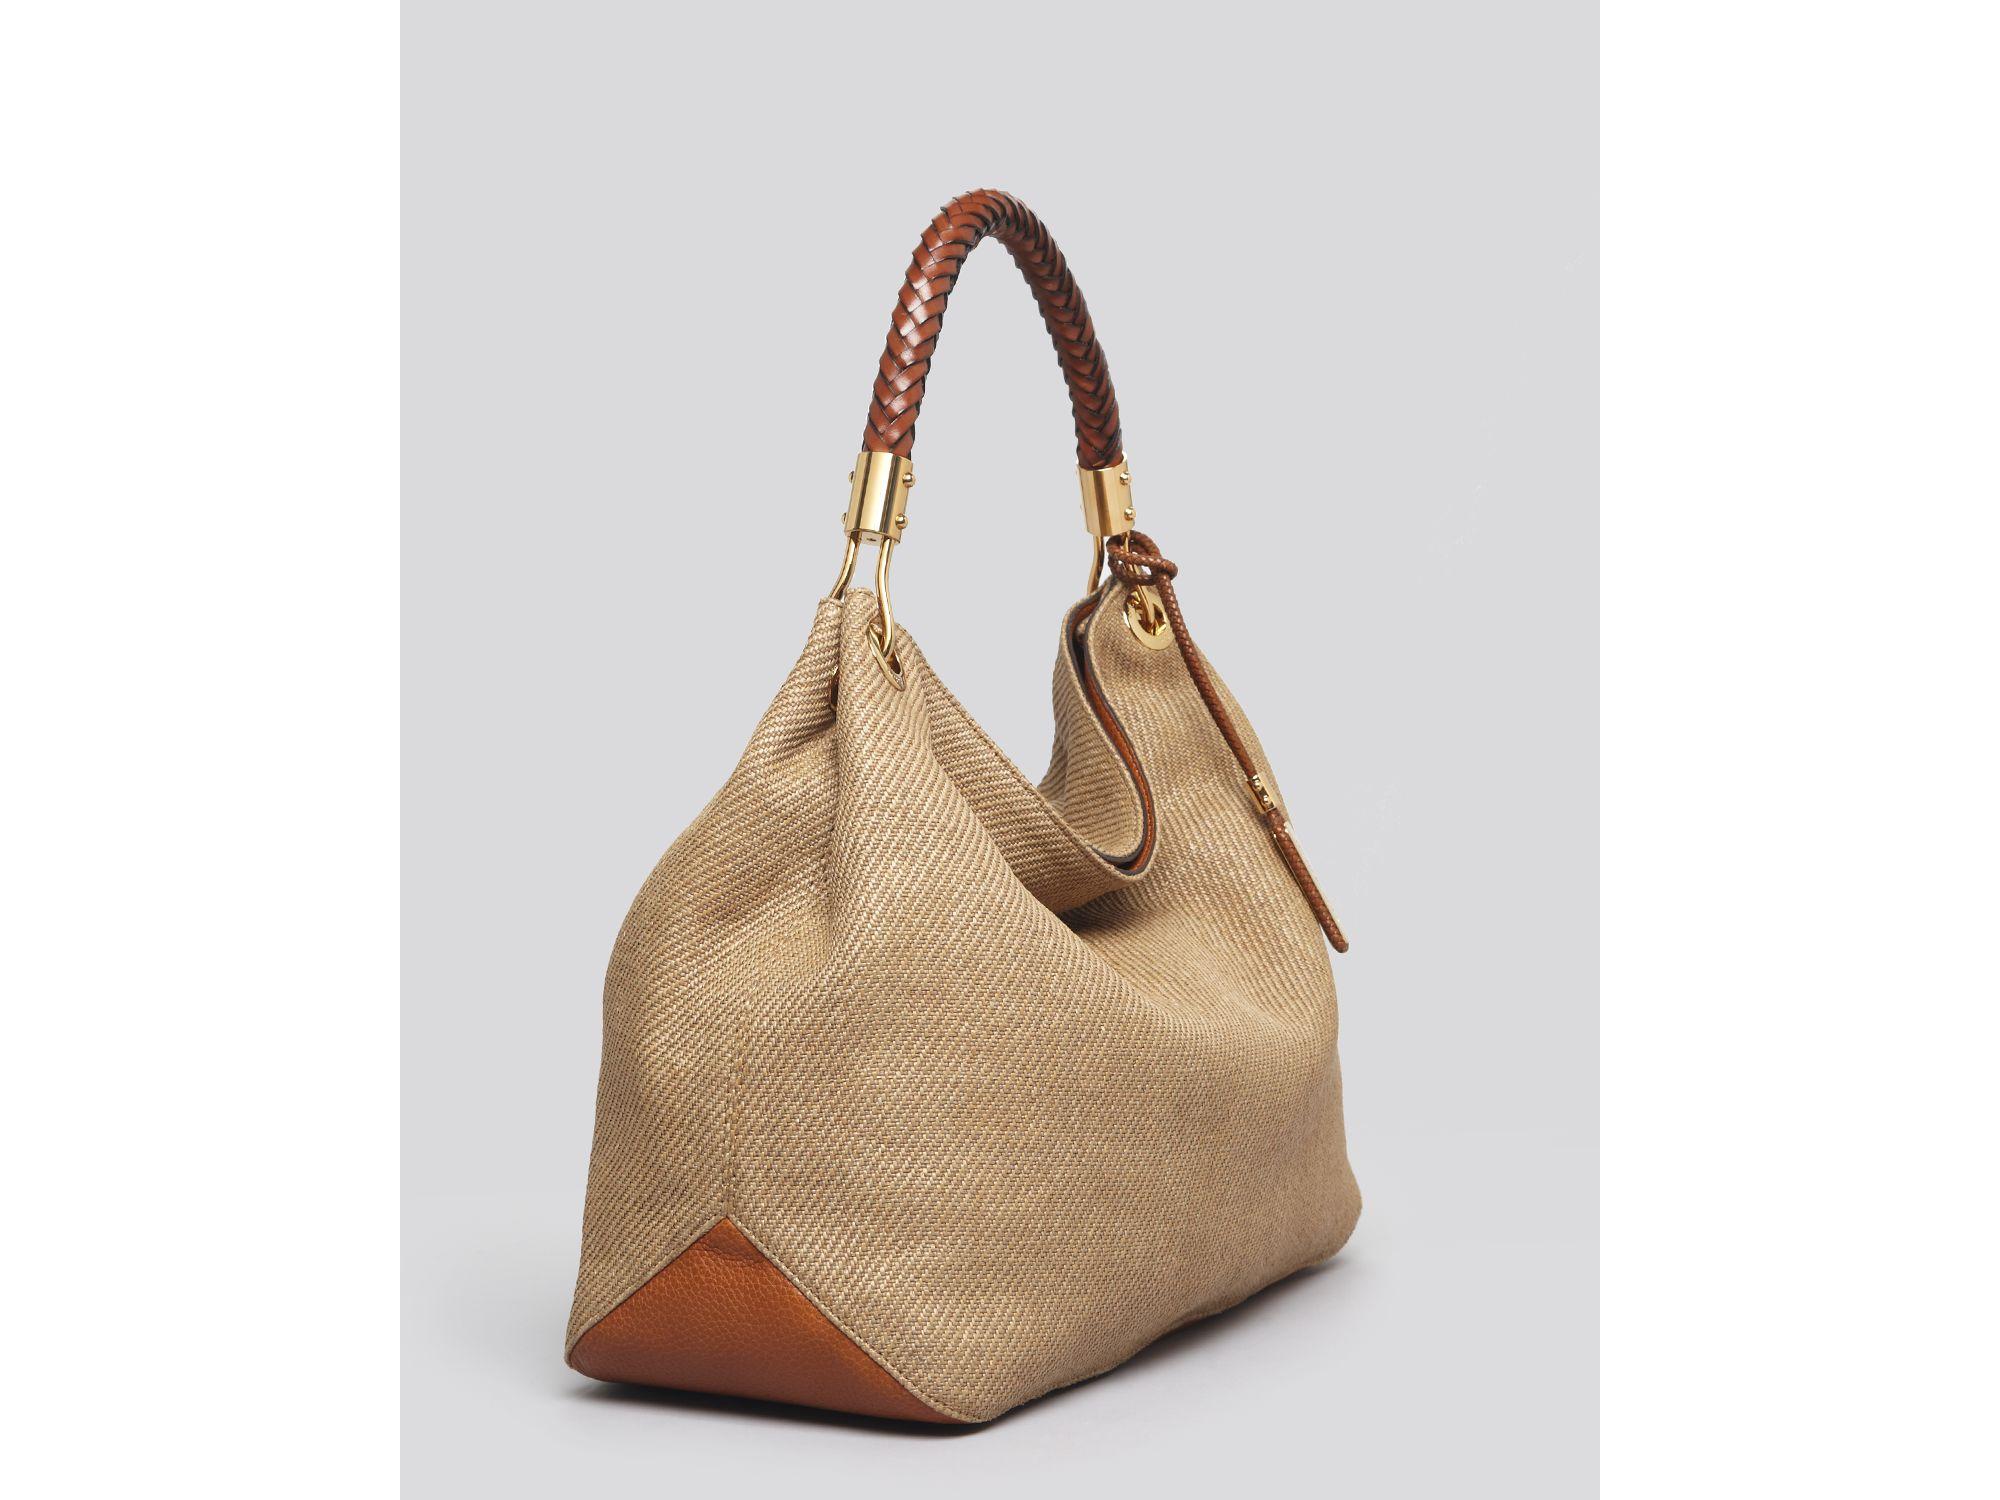 Lyst - Michael Kors Large Shoulder Bag Skorpios Woven in Natural fdb9f7ee14b8f